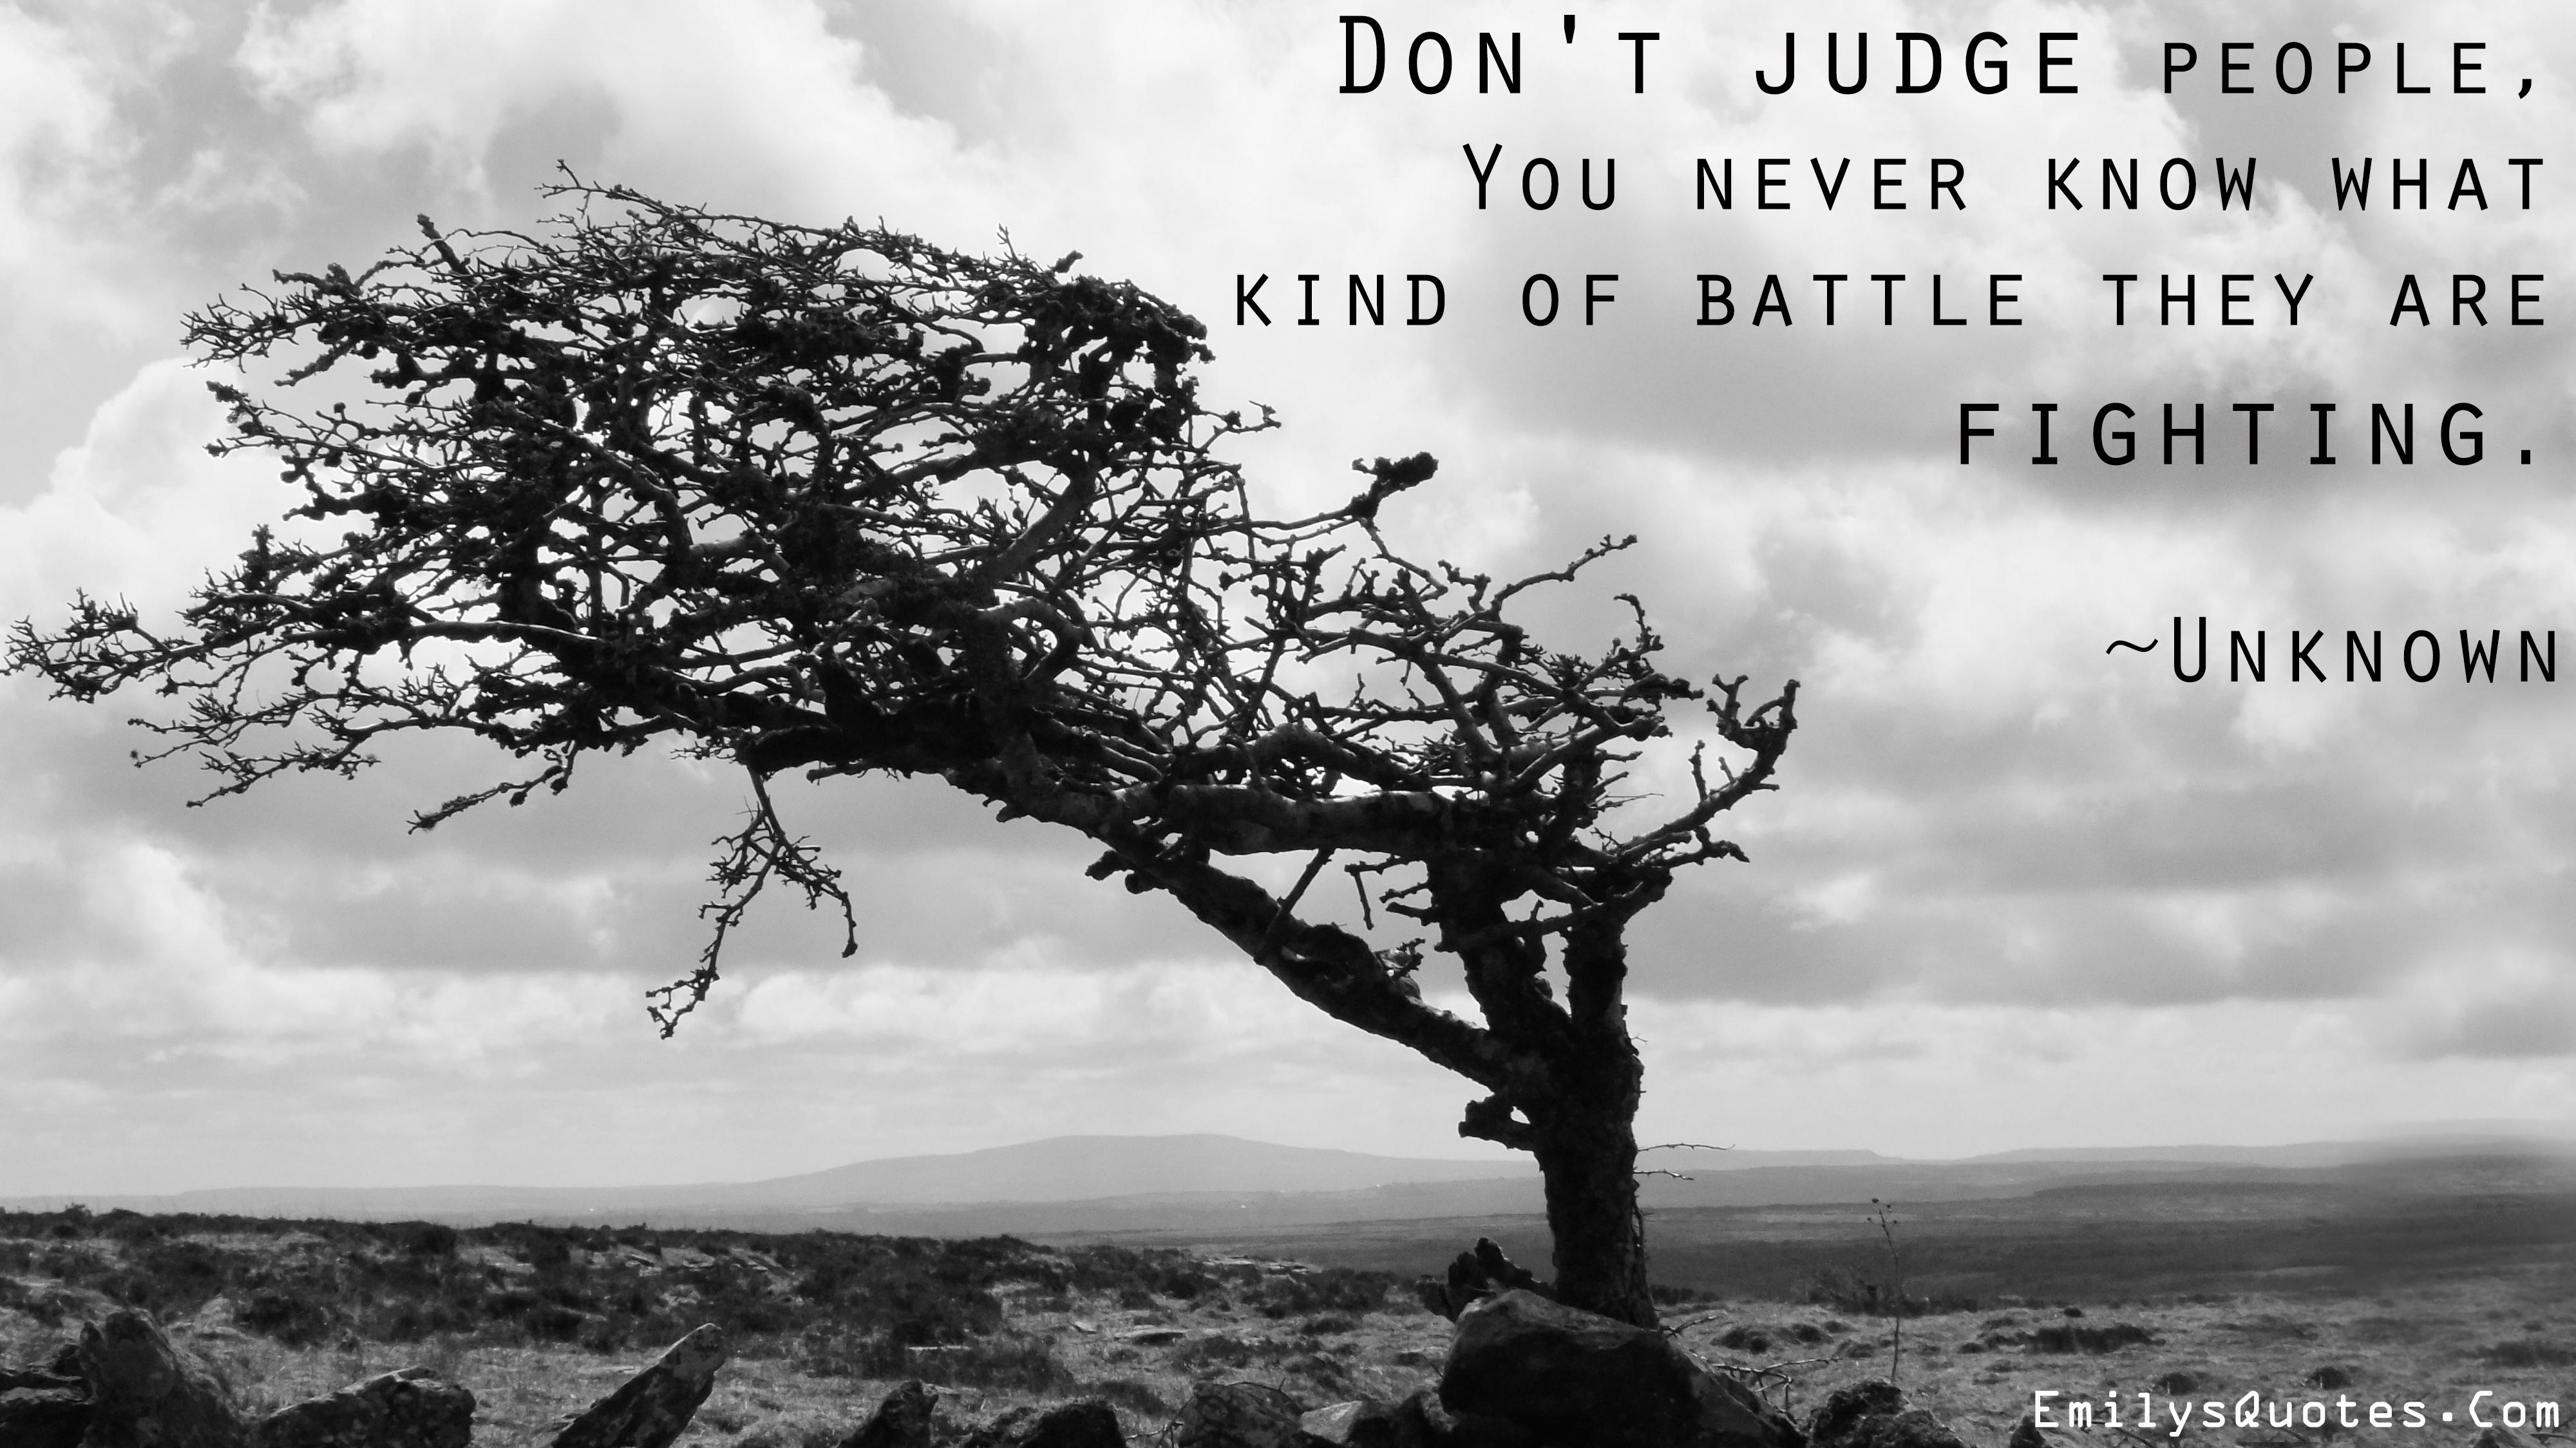 EmilysQuotes.Com - judge, battle, people, amazing, unknown